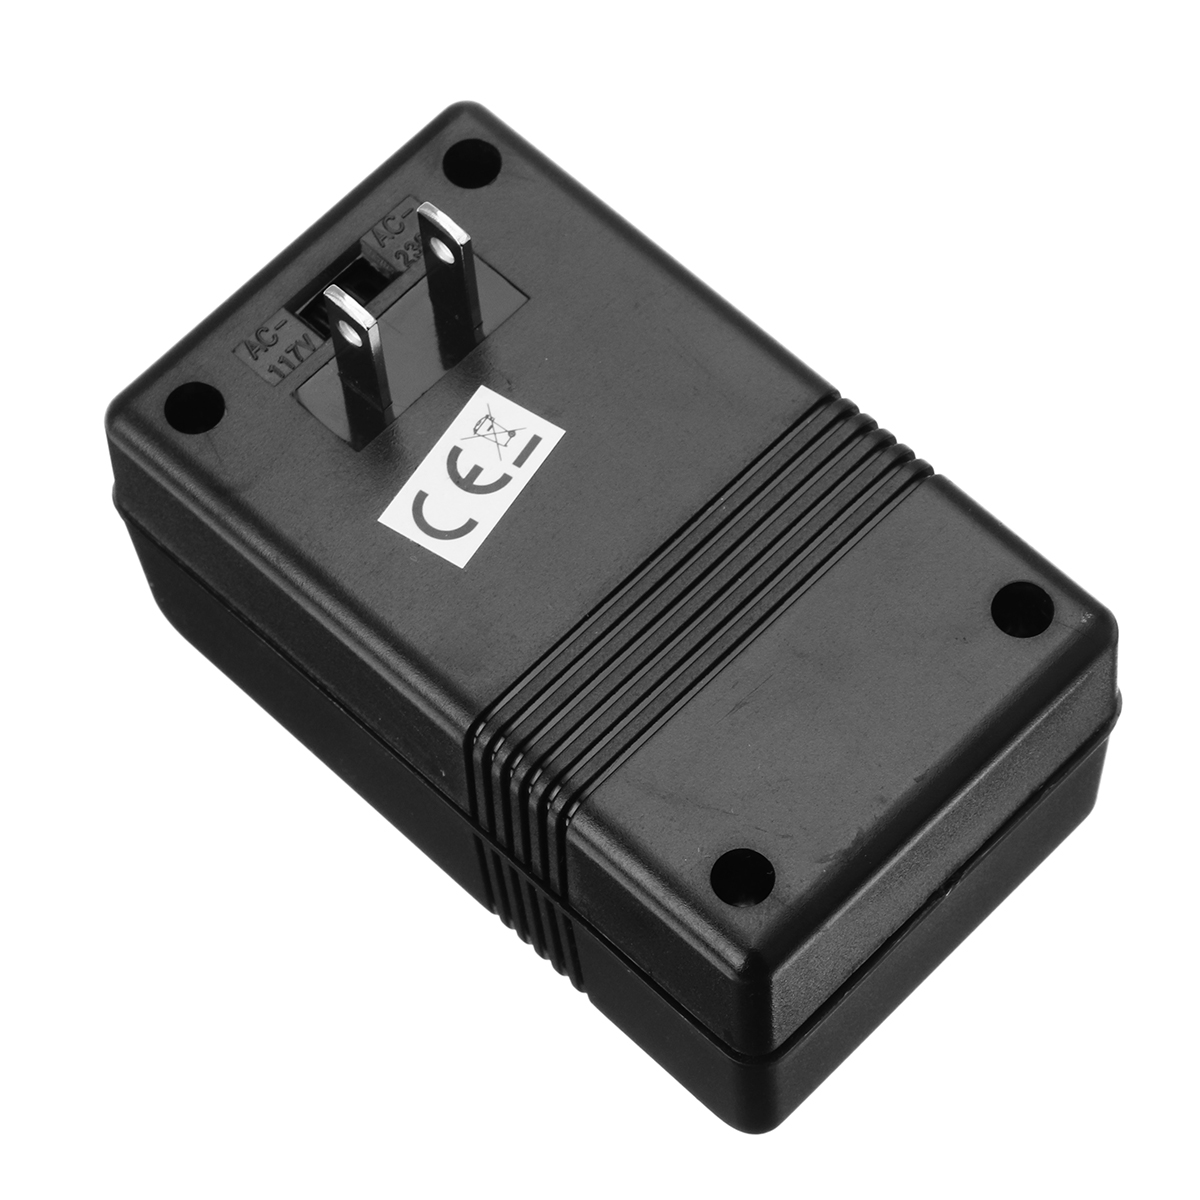 100W AC 110V to 220V 220V to 110V Power Converter Adapter Dual Voltage Converter Transformer For Electrical Appliances Travel 200watt single phase ac 220v to 110v step down travel voltage transformer volt converter adapter